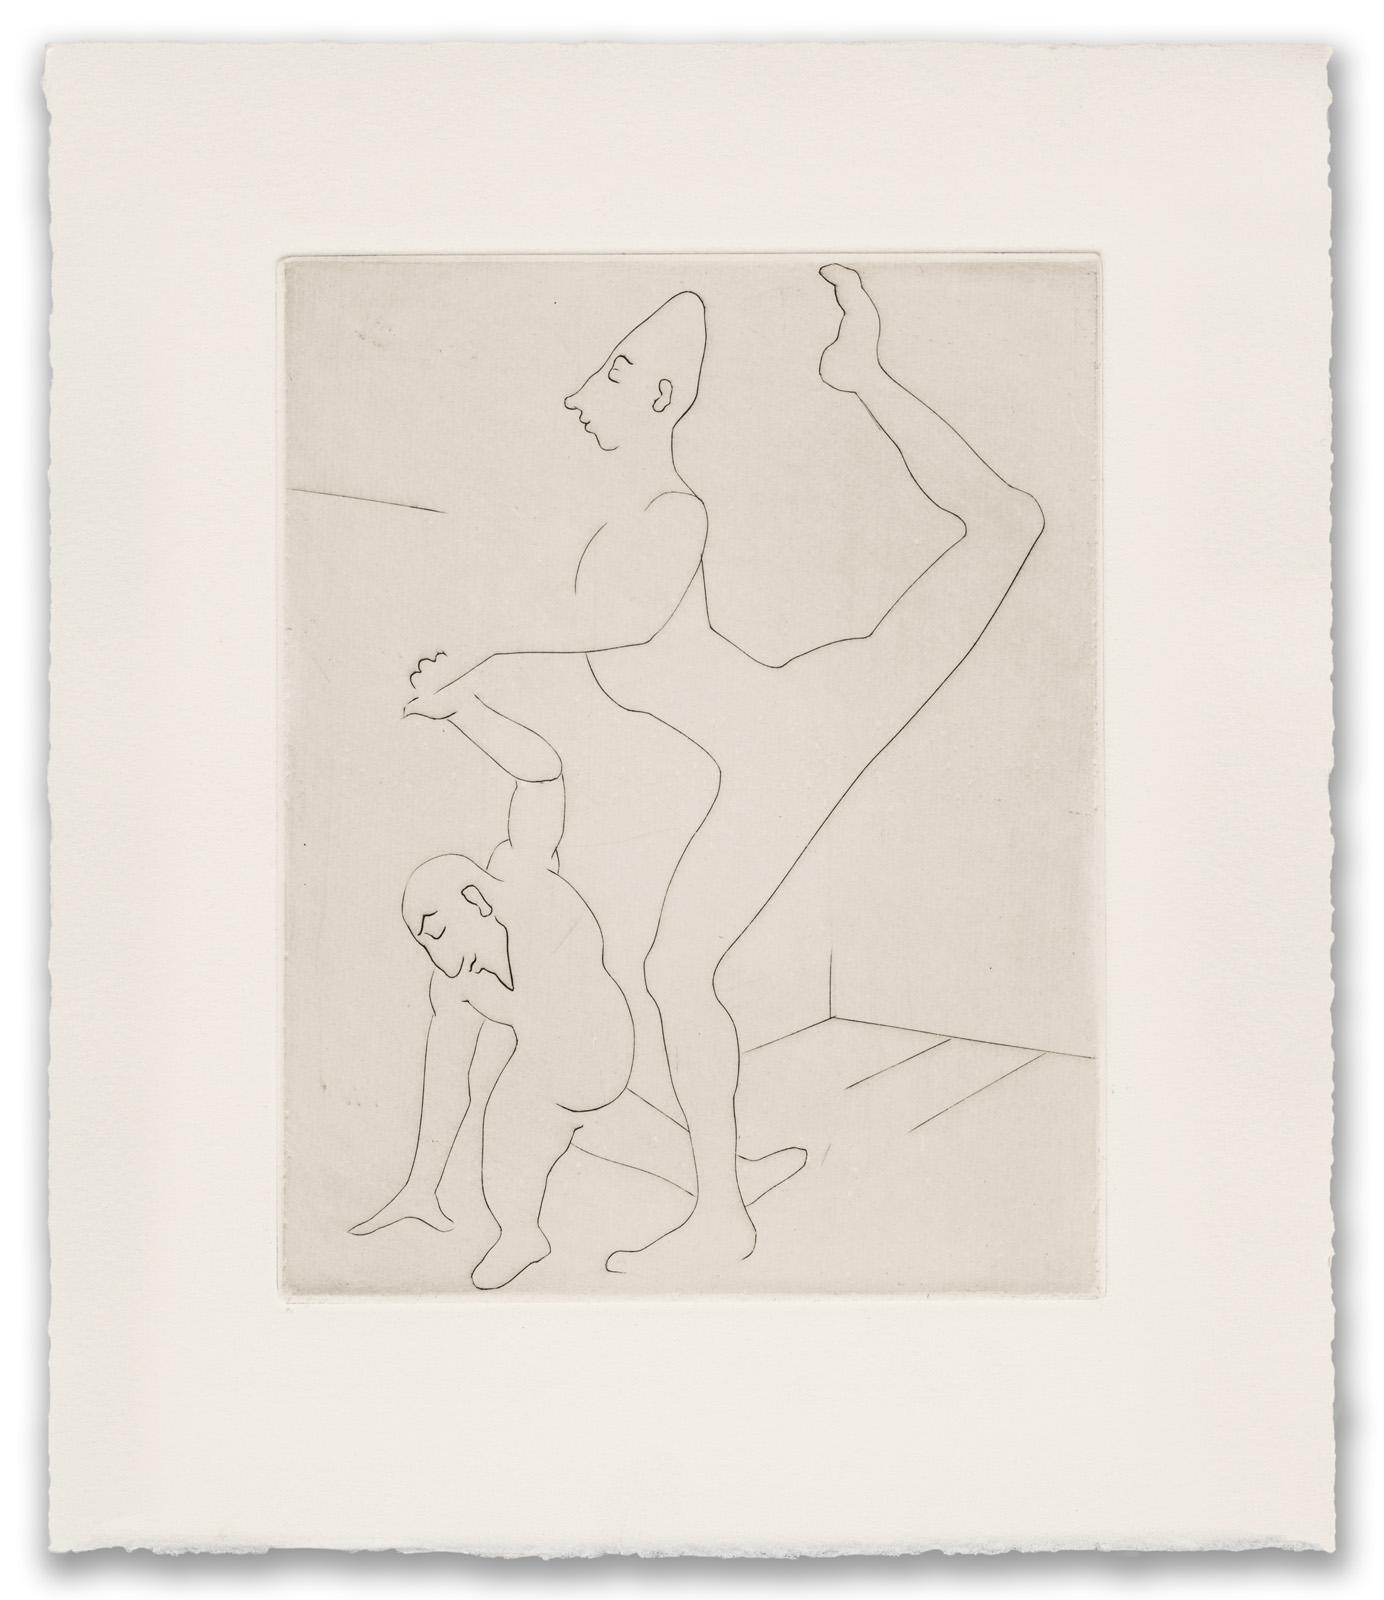 Francis West, (British 1936-2015), Dancers, c.1999 (2017 Edition).